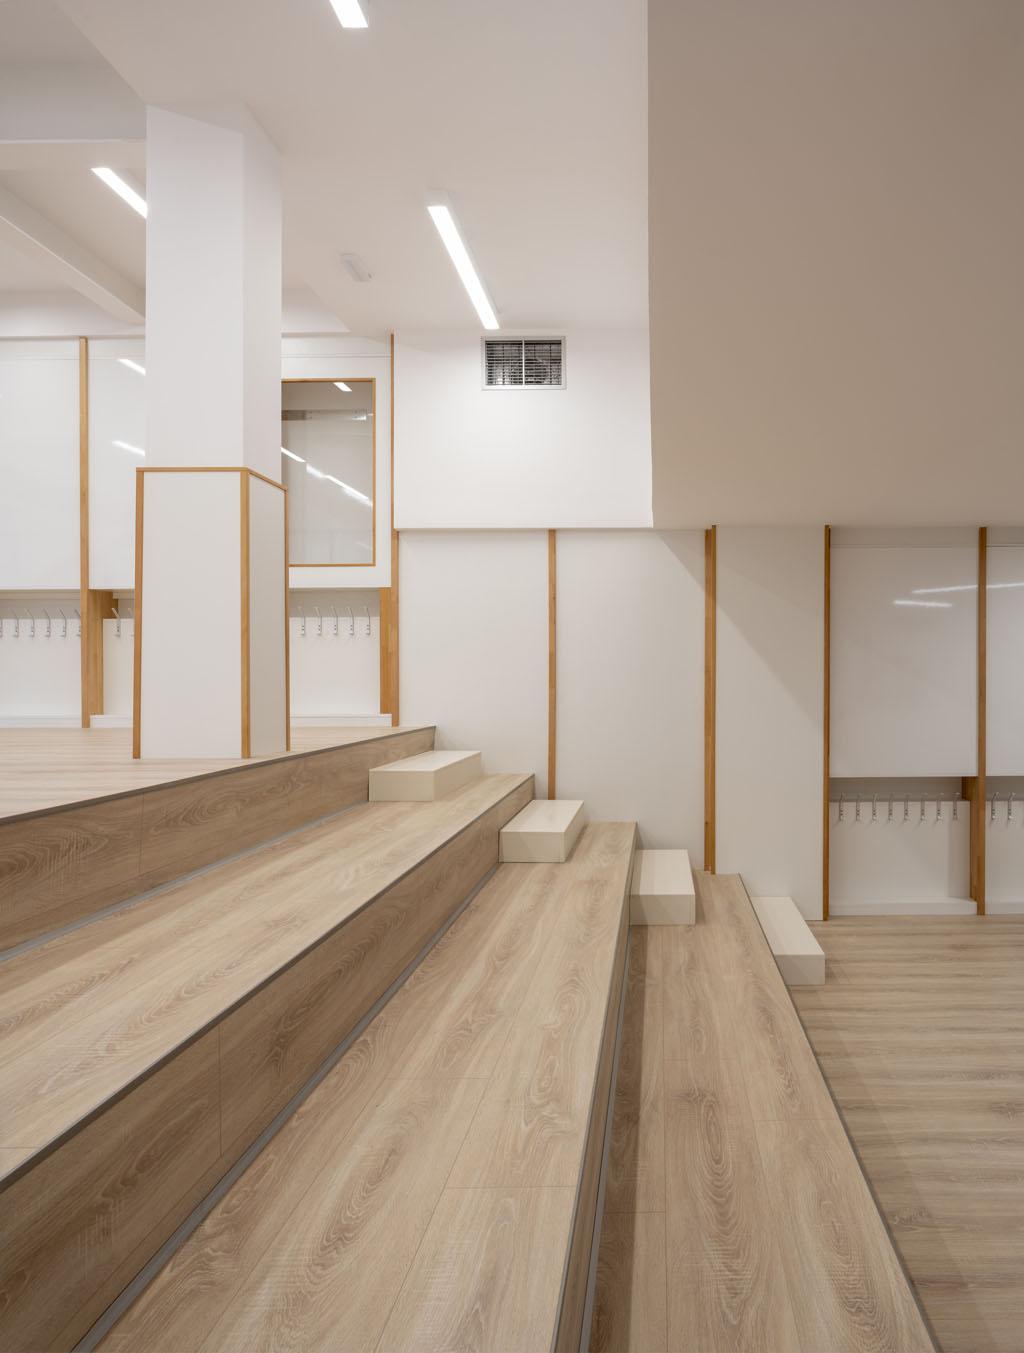 BEGOÑAZPI_WEB_46-Erlantz Biderbost fotografo de arquitectura e interiores